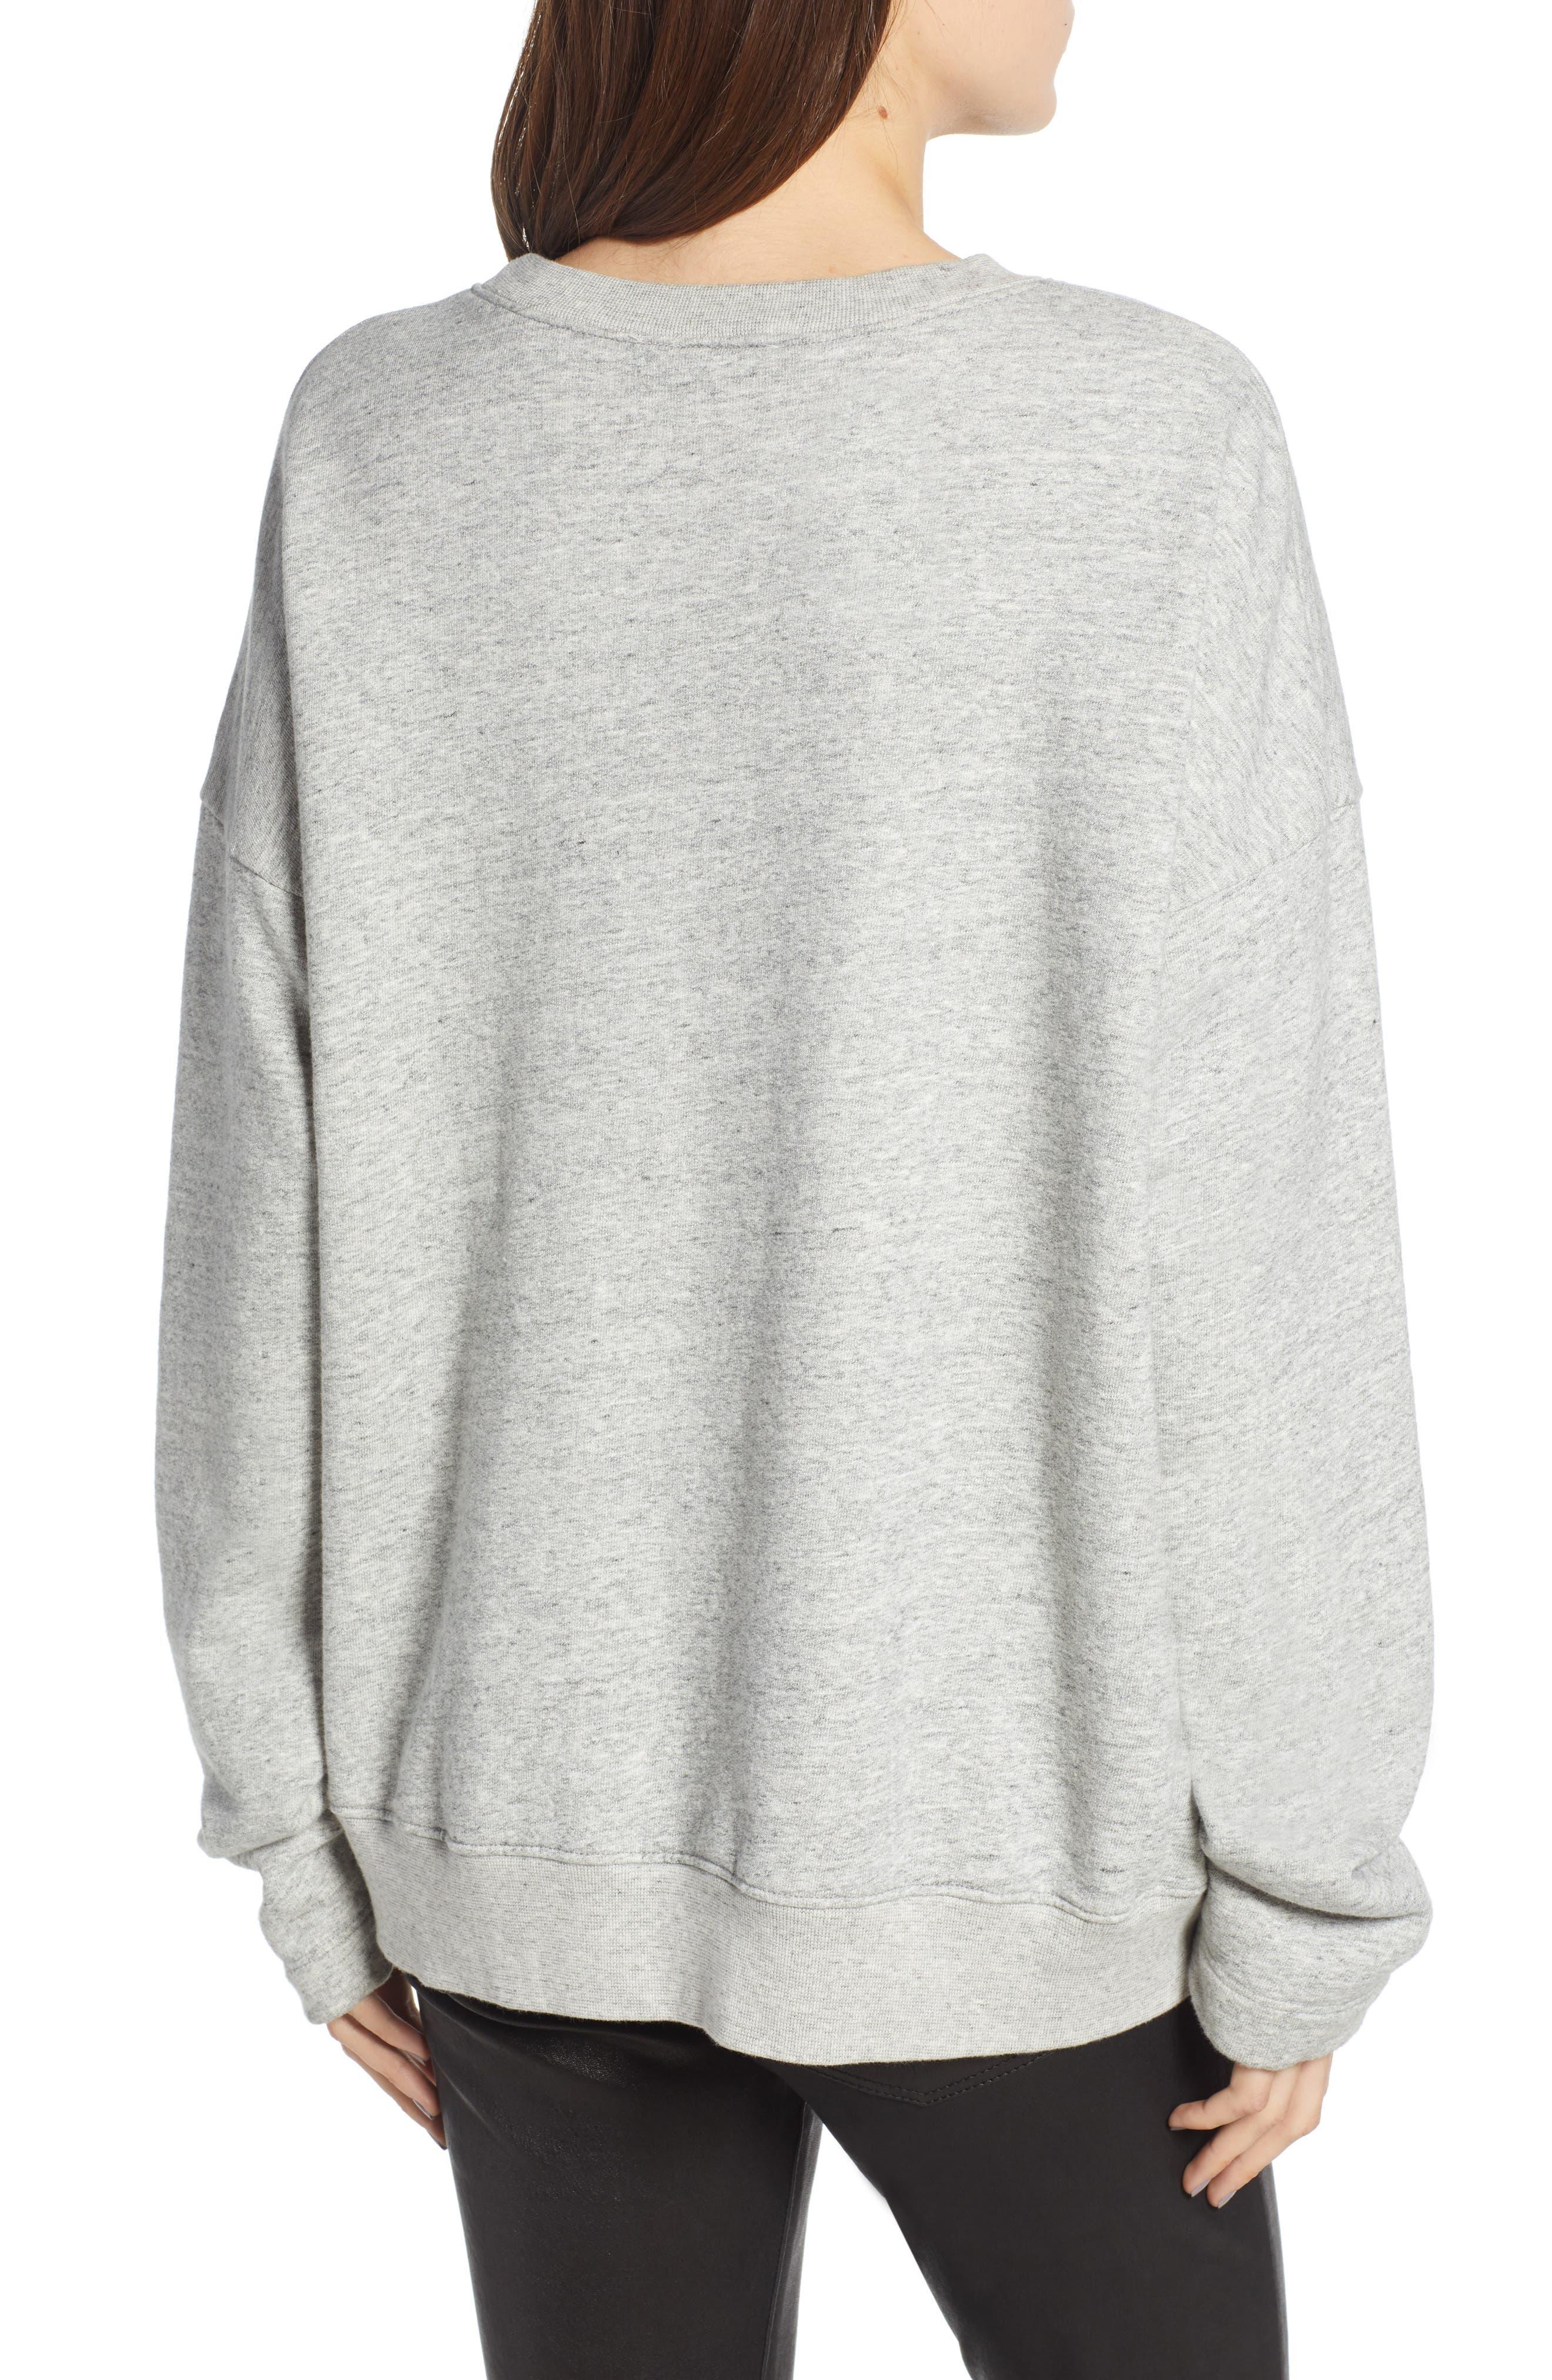 Berdine Oversize Sweatshirt,                             Alternate thumbnail 2, color,                             HEATHER GREY